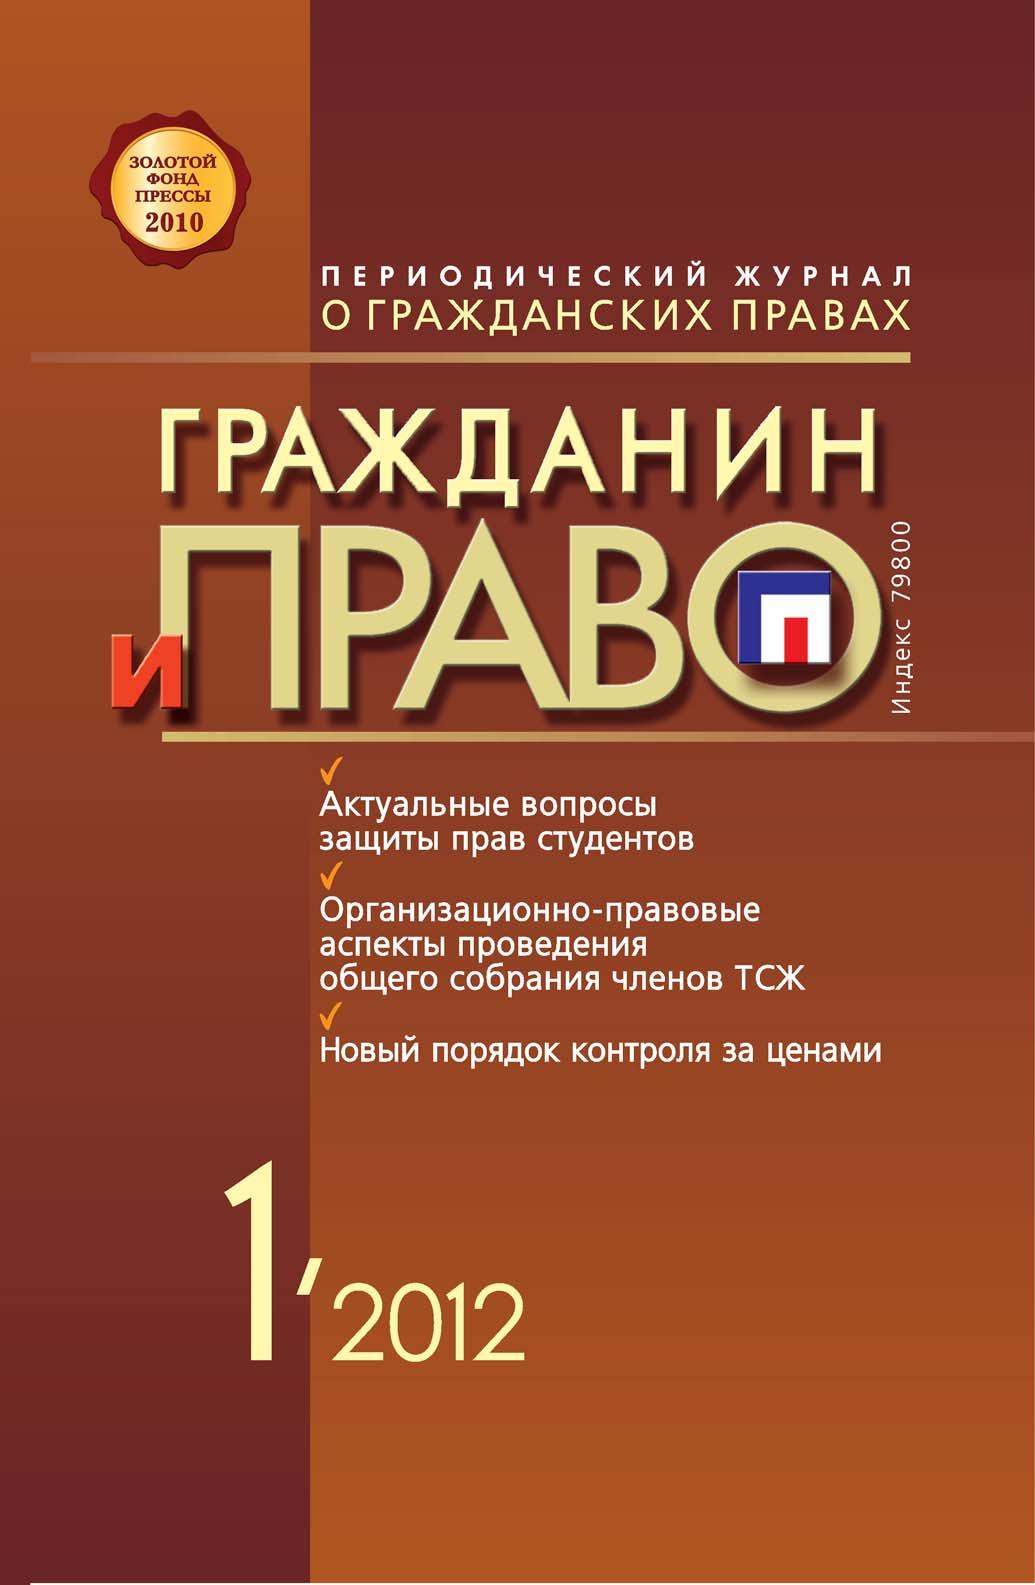 Гражданин и право №01/2012